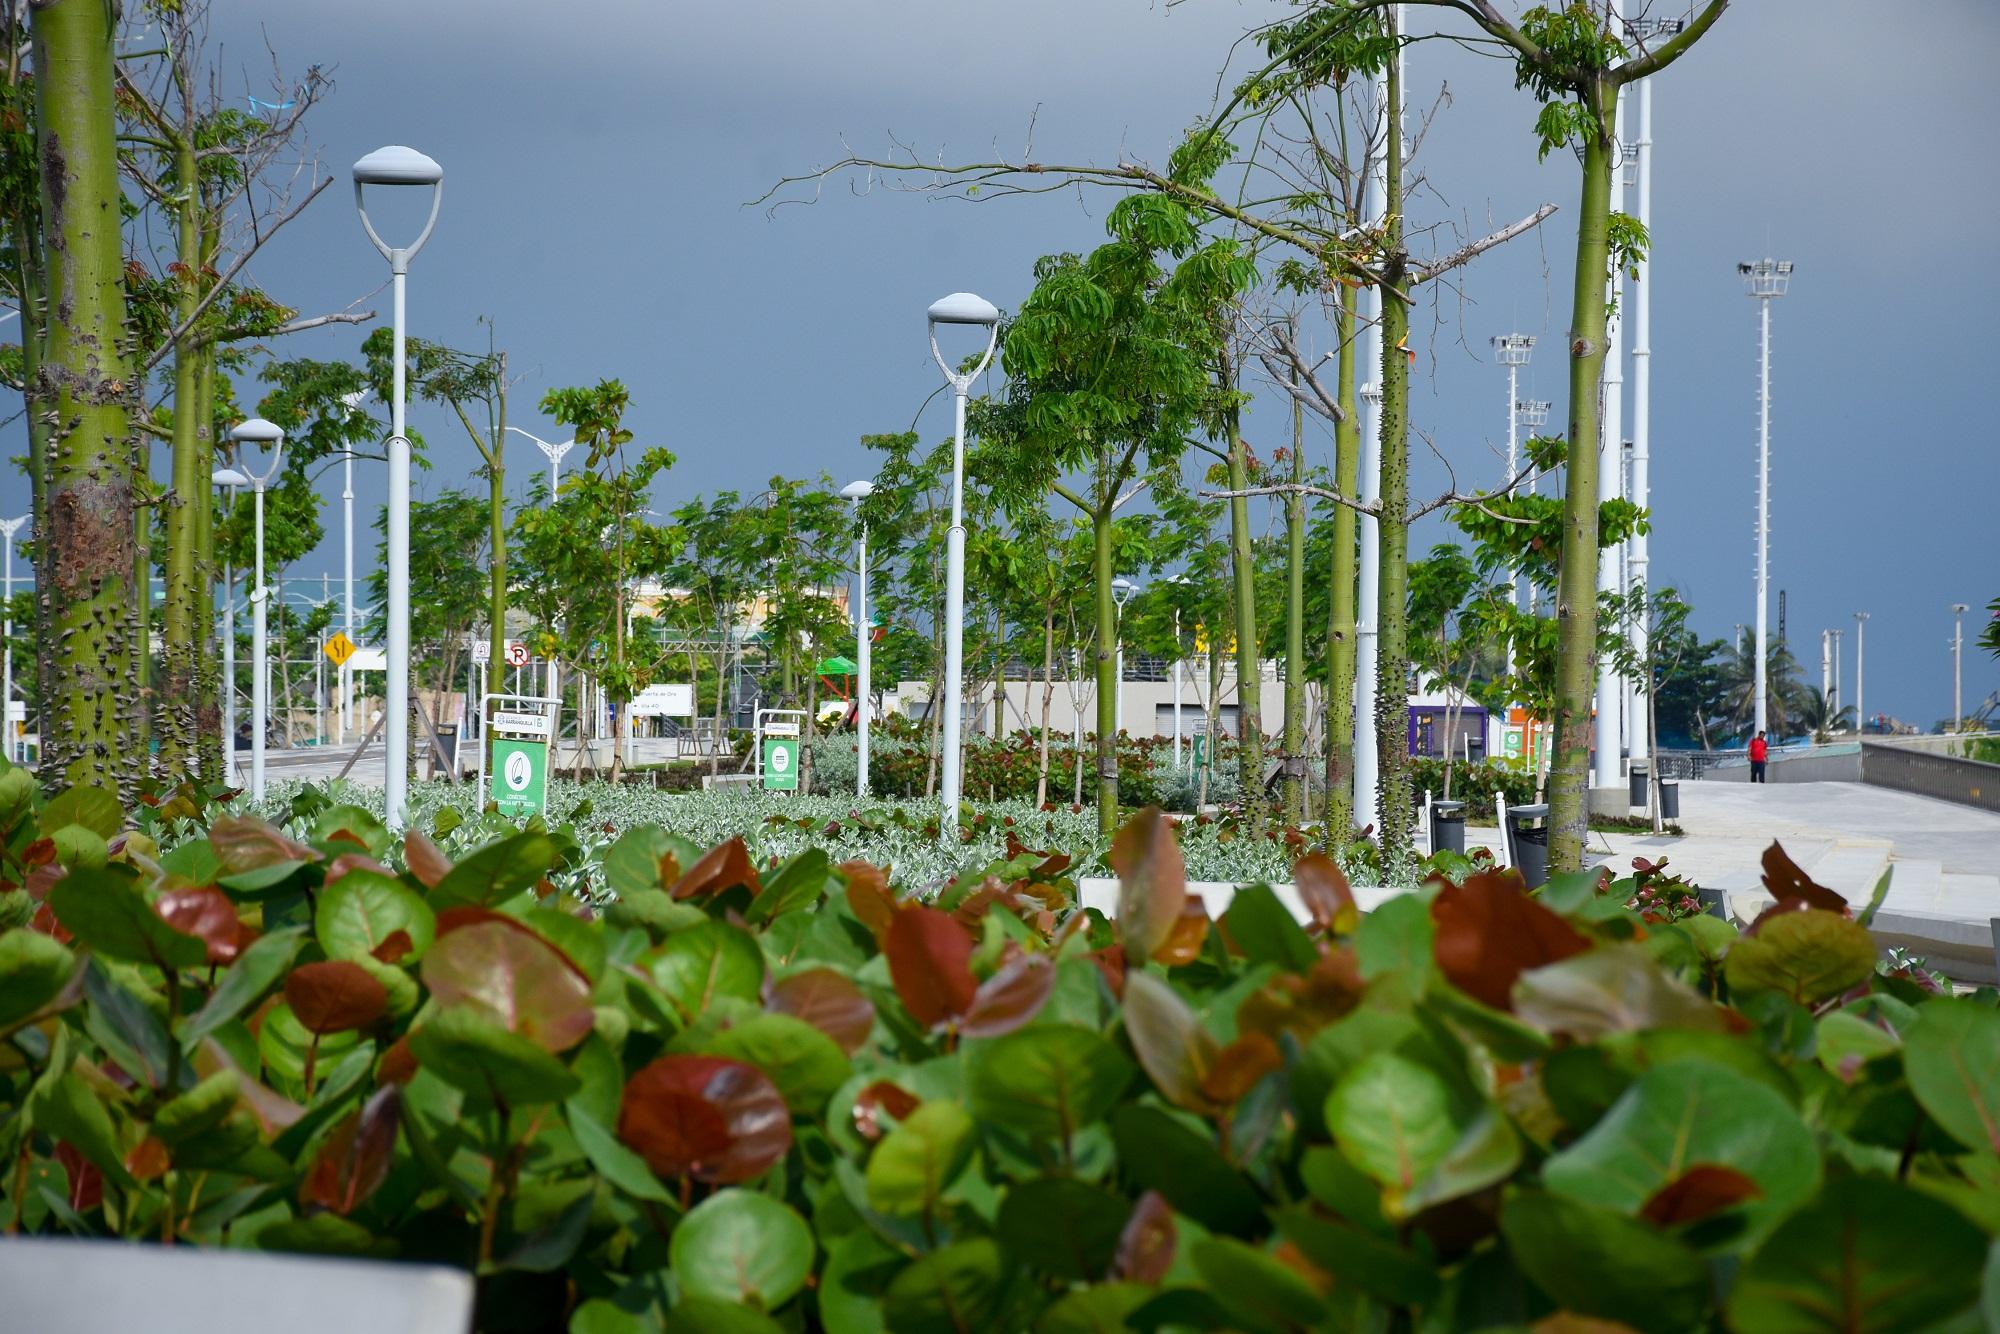 rboles Barranquilla - Siembra Barranquilla - Bosques Urbanos